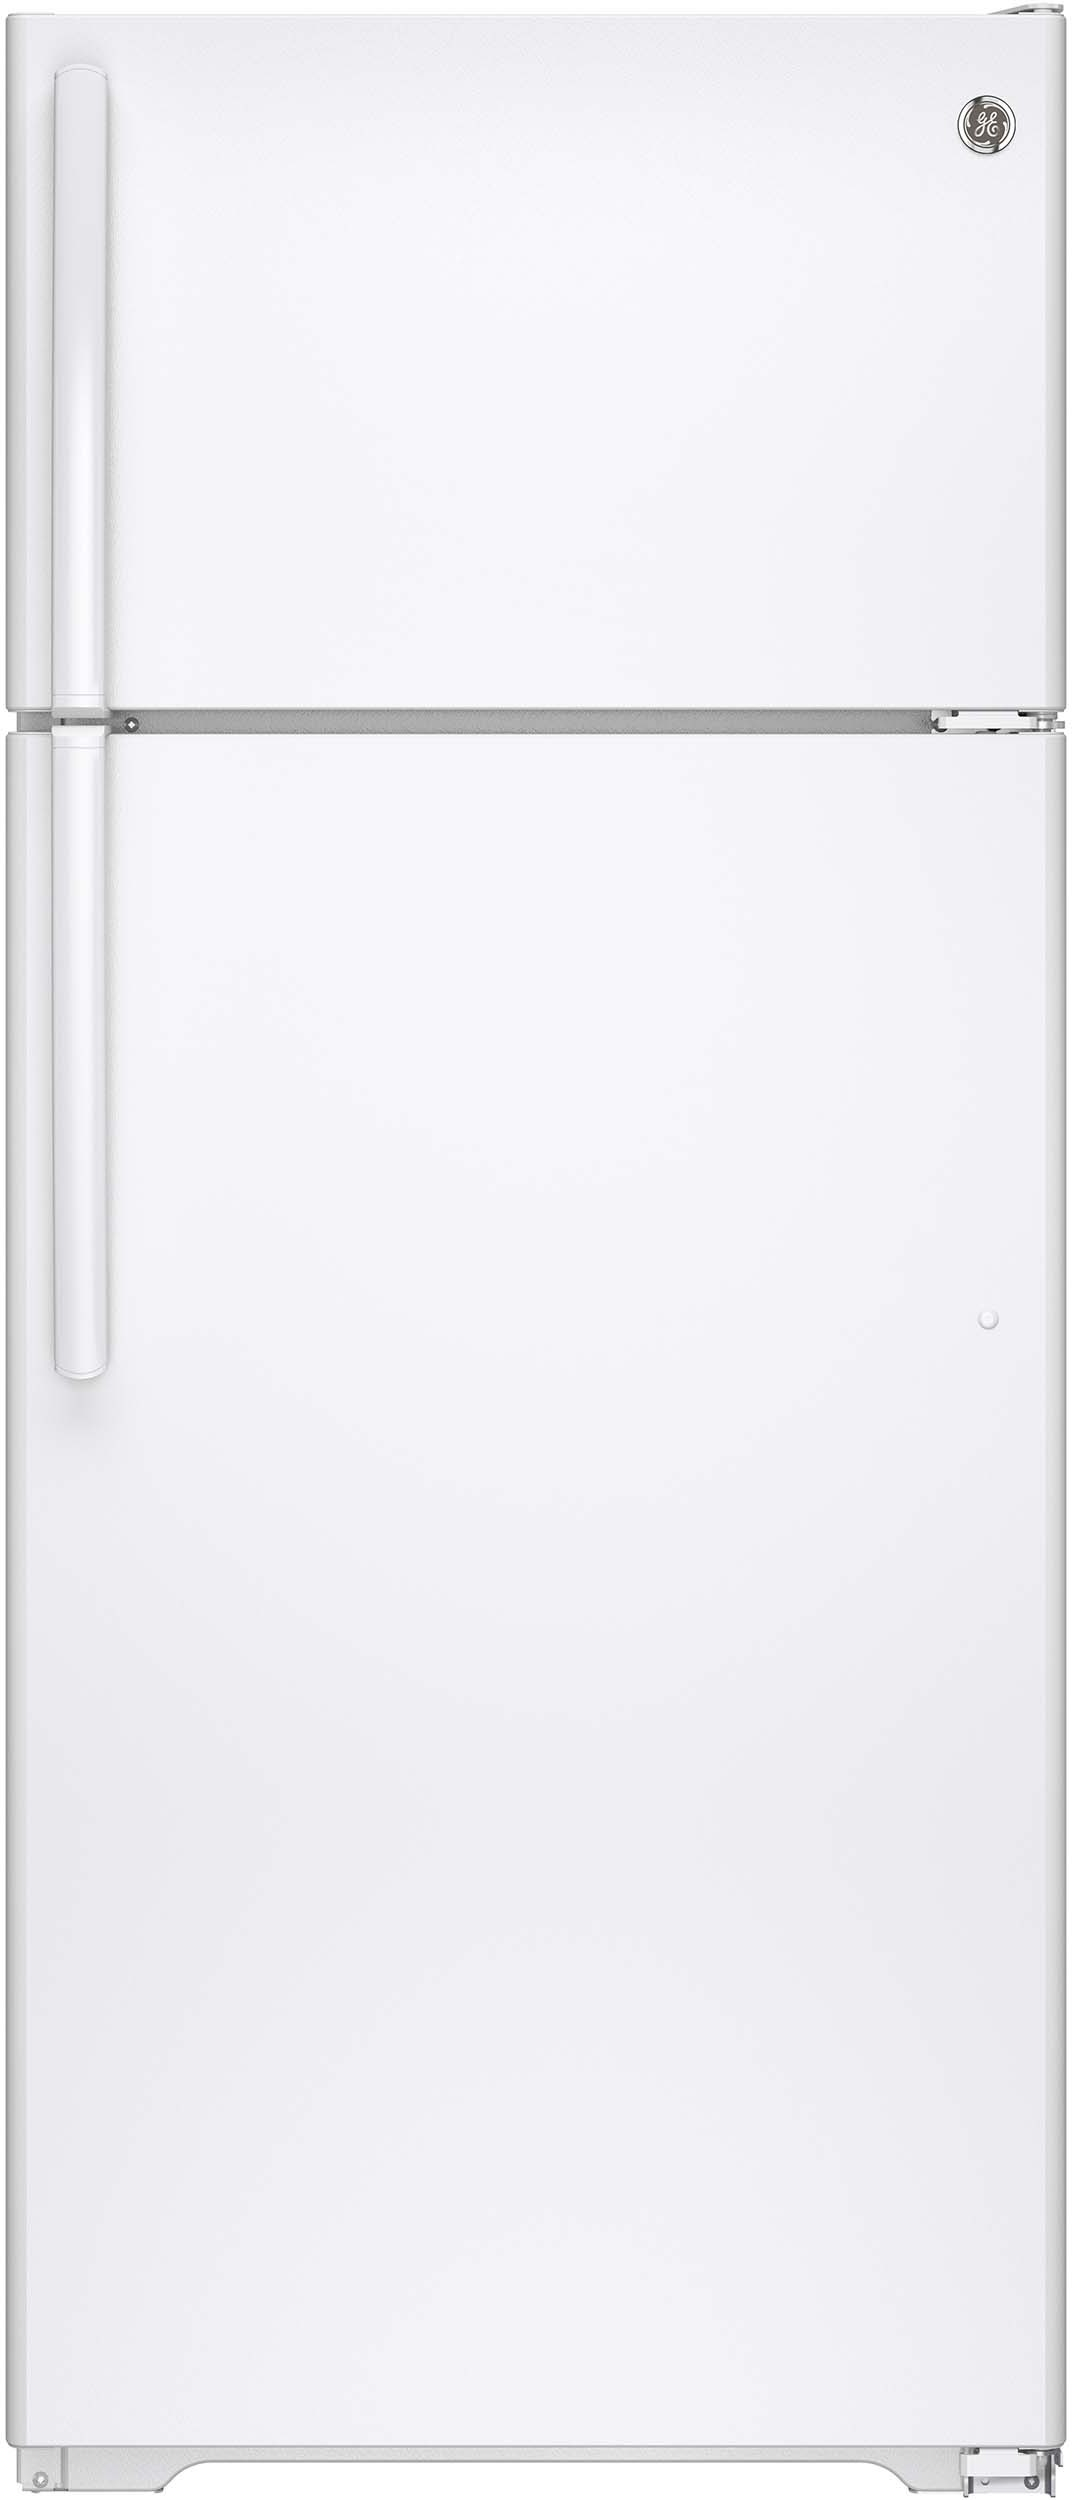 Ge Gte18gth 28 Inch Top Freezer Refrigerator With 17 5 Cu